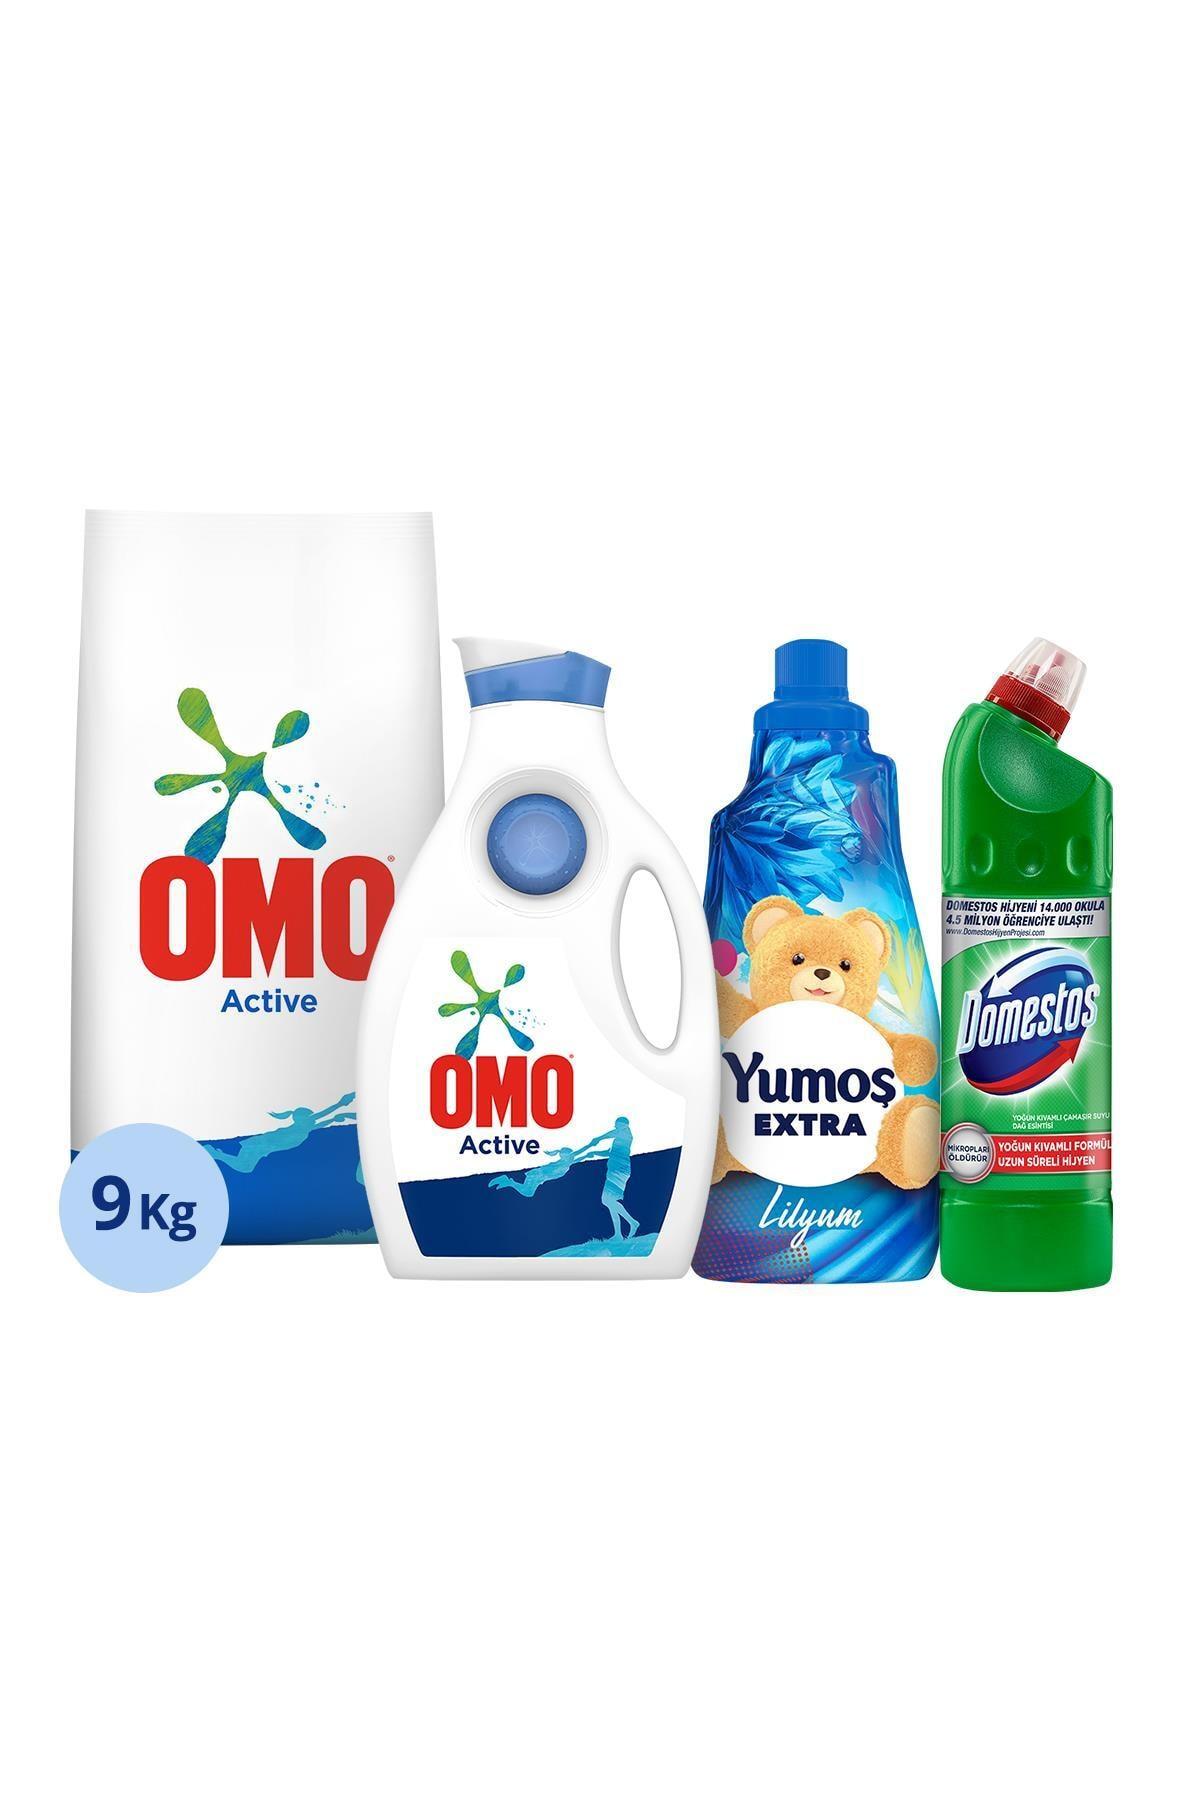 Omo Active Toz Det. 9kg + Yumoş Lilyum 1440ML + Domestos 750ML + Omo Active Sıvı Çam. Det. 1950ML